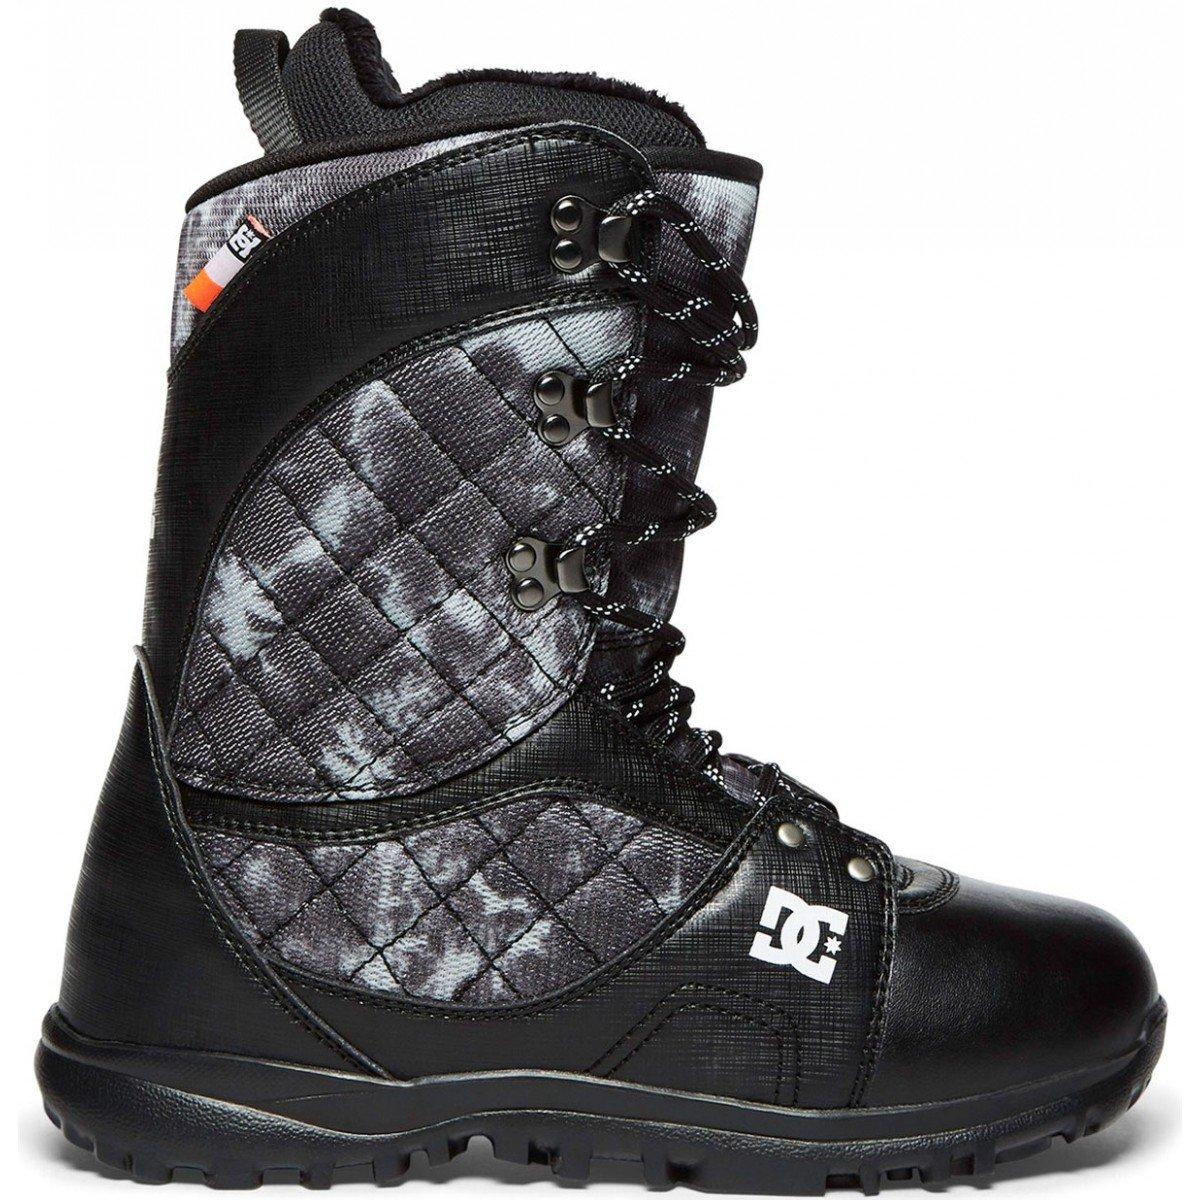 DC Women's Karma Snowboard Boots